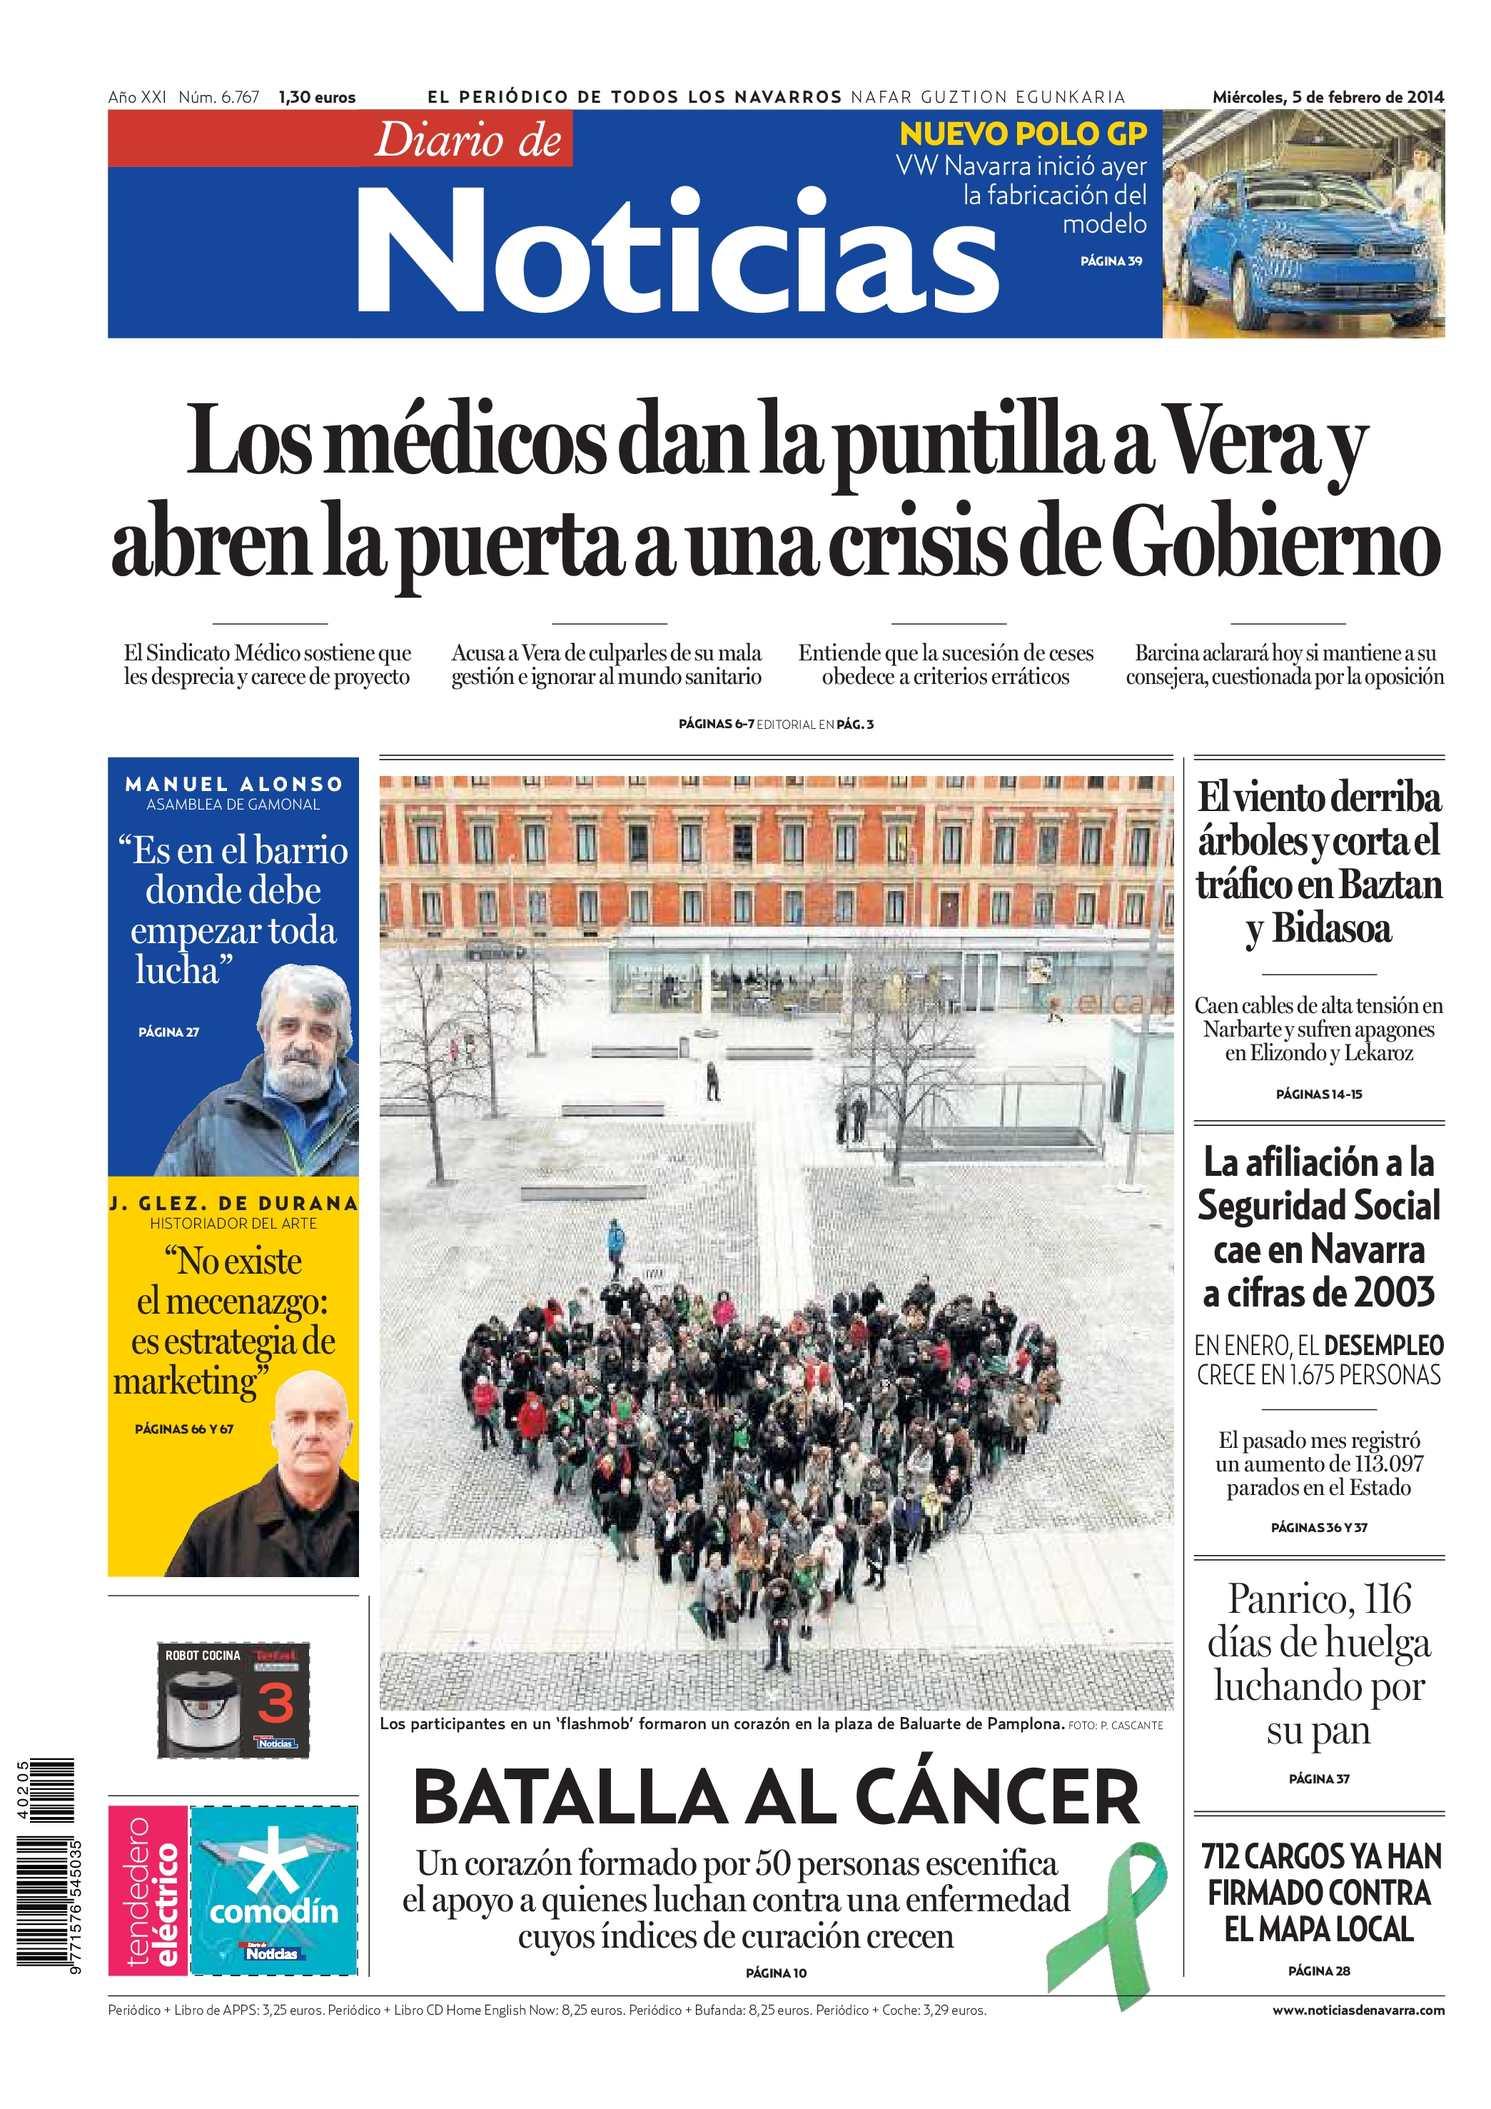 9dacf0035af1 Calaméo - Diario de Noticias 20140205